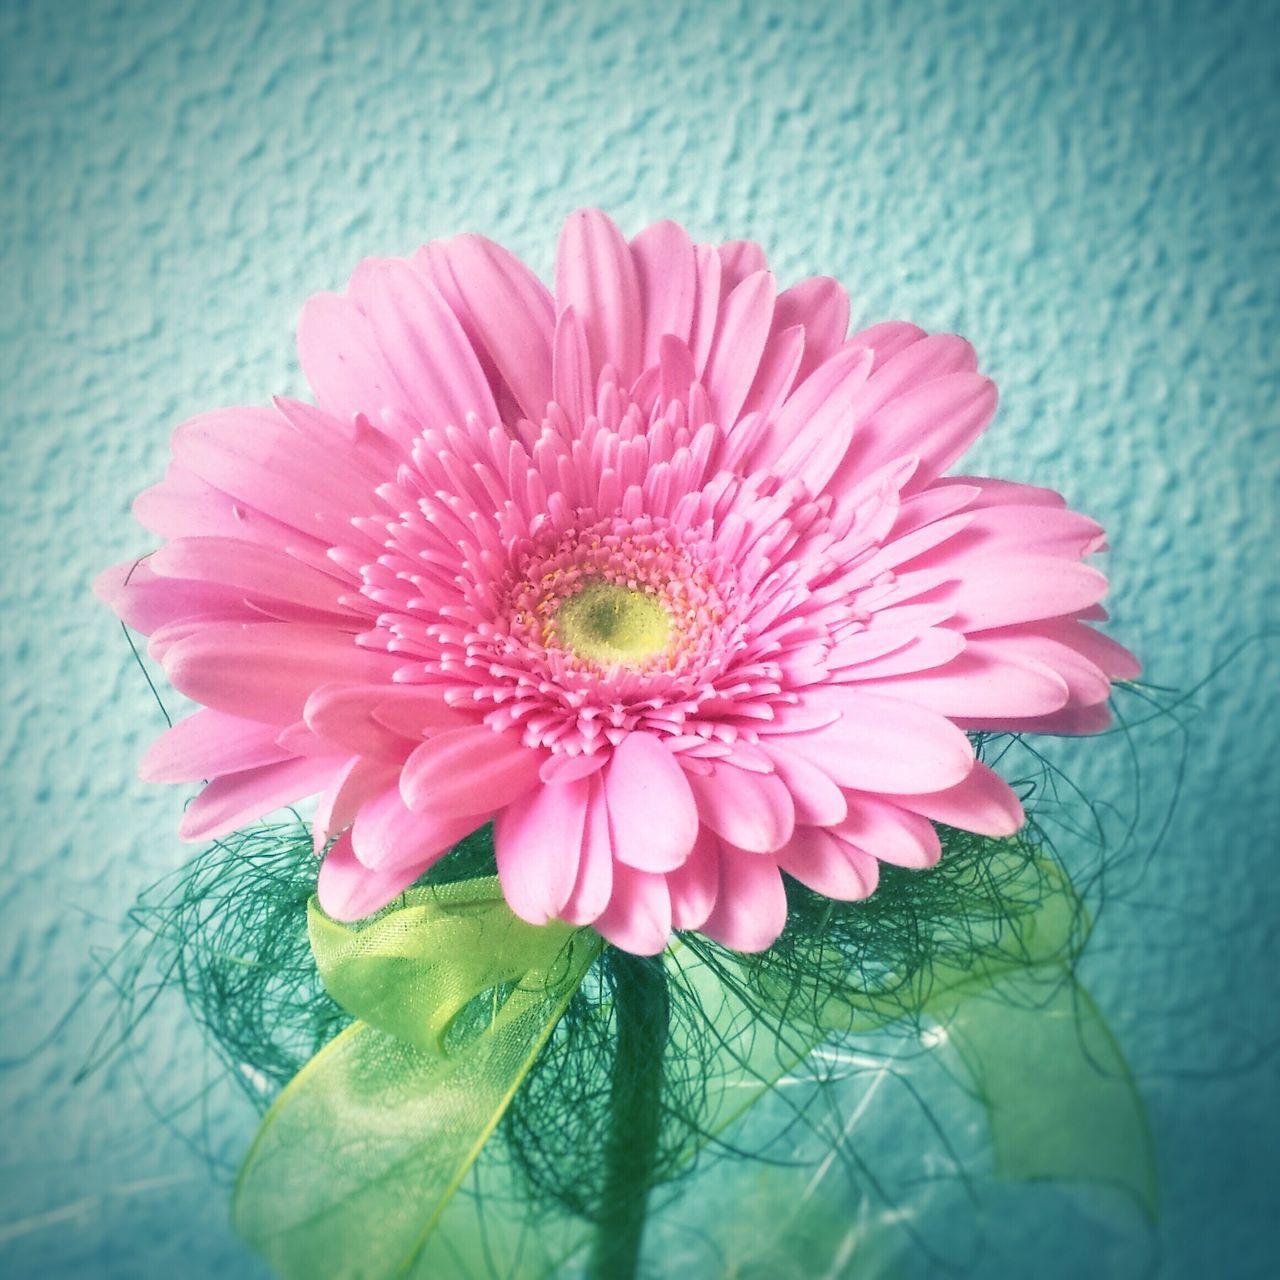 Pastel Power Pink Flowers Flowerporn Flower Collection EyeEm Best Shots EyeEm Nature Lover Eye4photography  EyeEm Gallery Pink Flower Pink Flowers Pastel Colors Pastel Power! Minimal Minimalism Minimal Pastel Millennial Pink